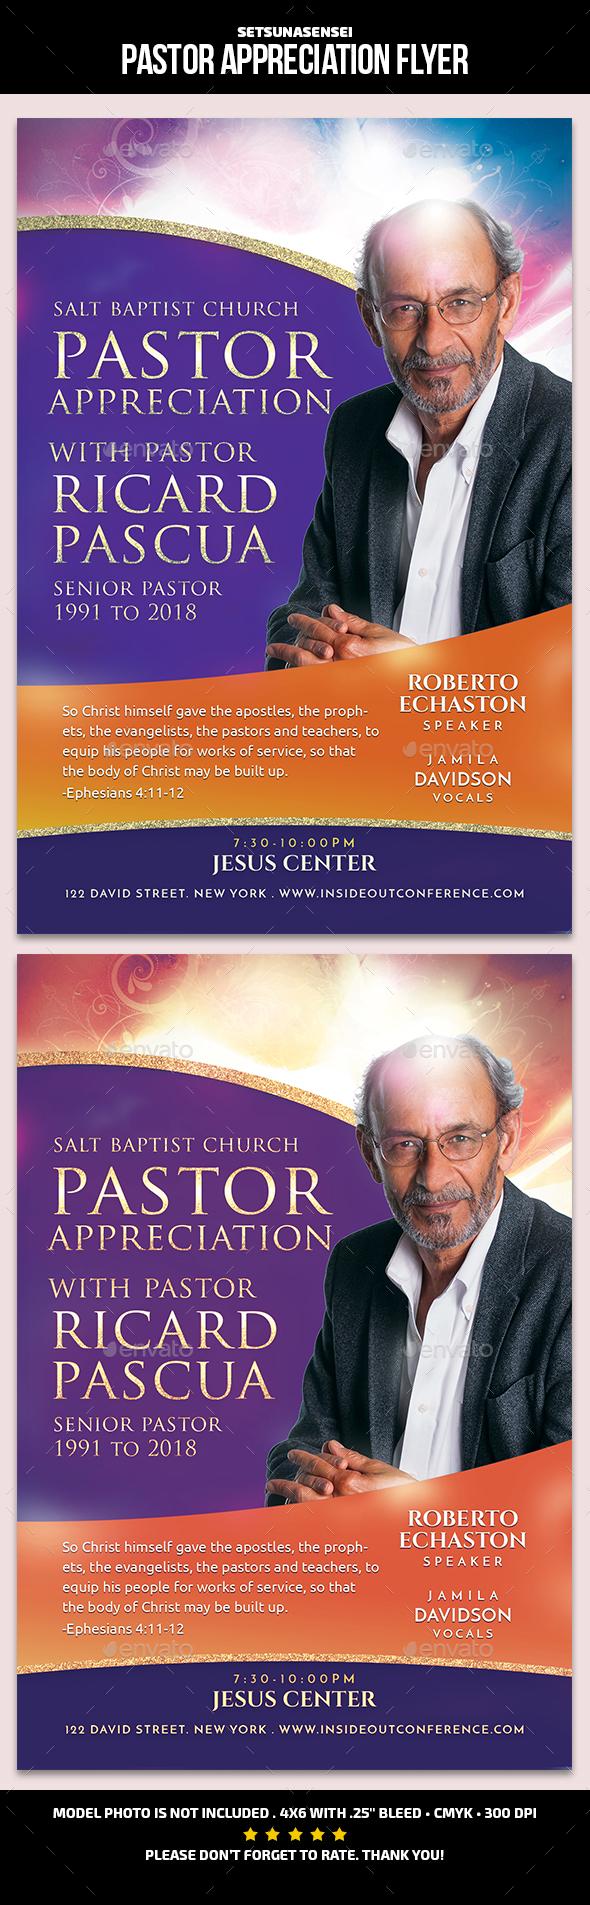 Pastor Appreciation Flyer - Church Flyers